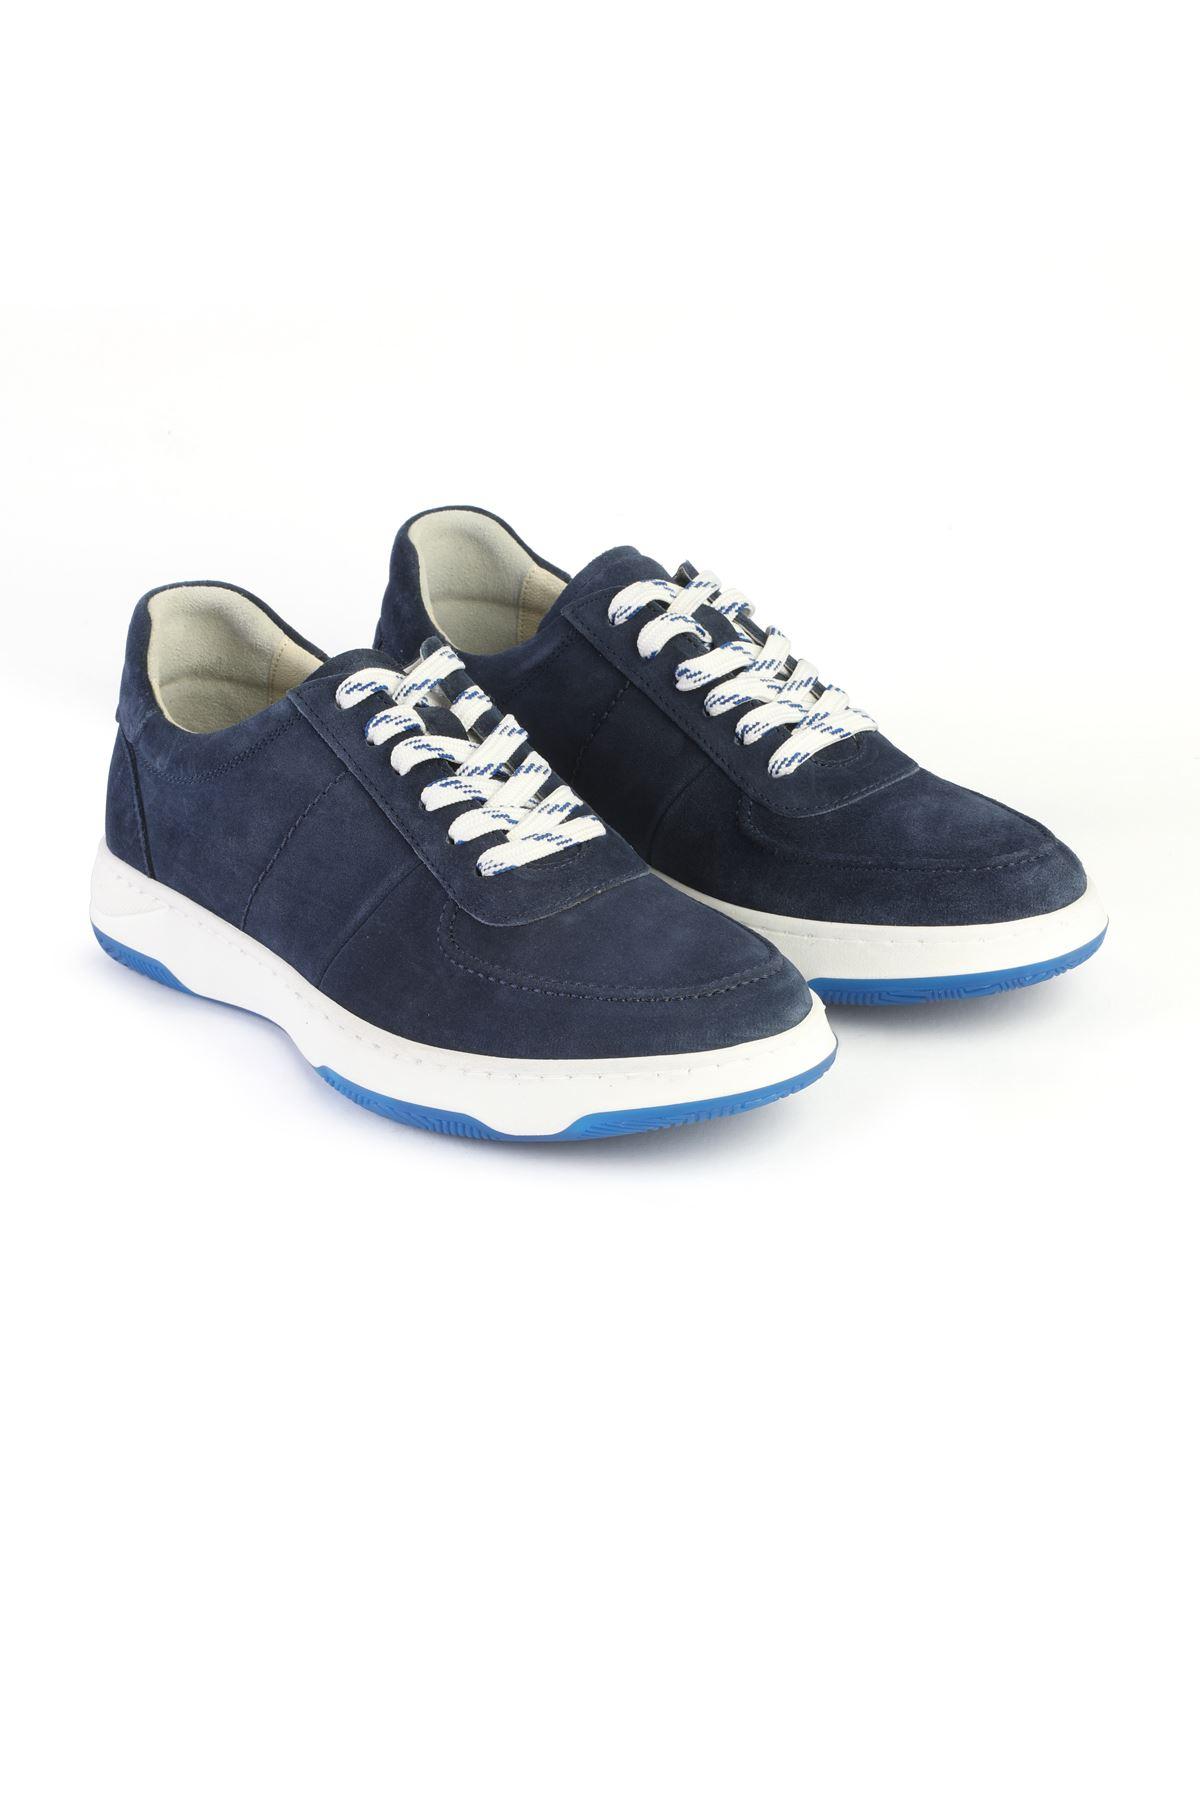 Libero 3228 Navy Blue Sports Shoes